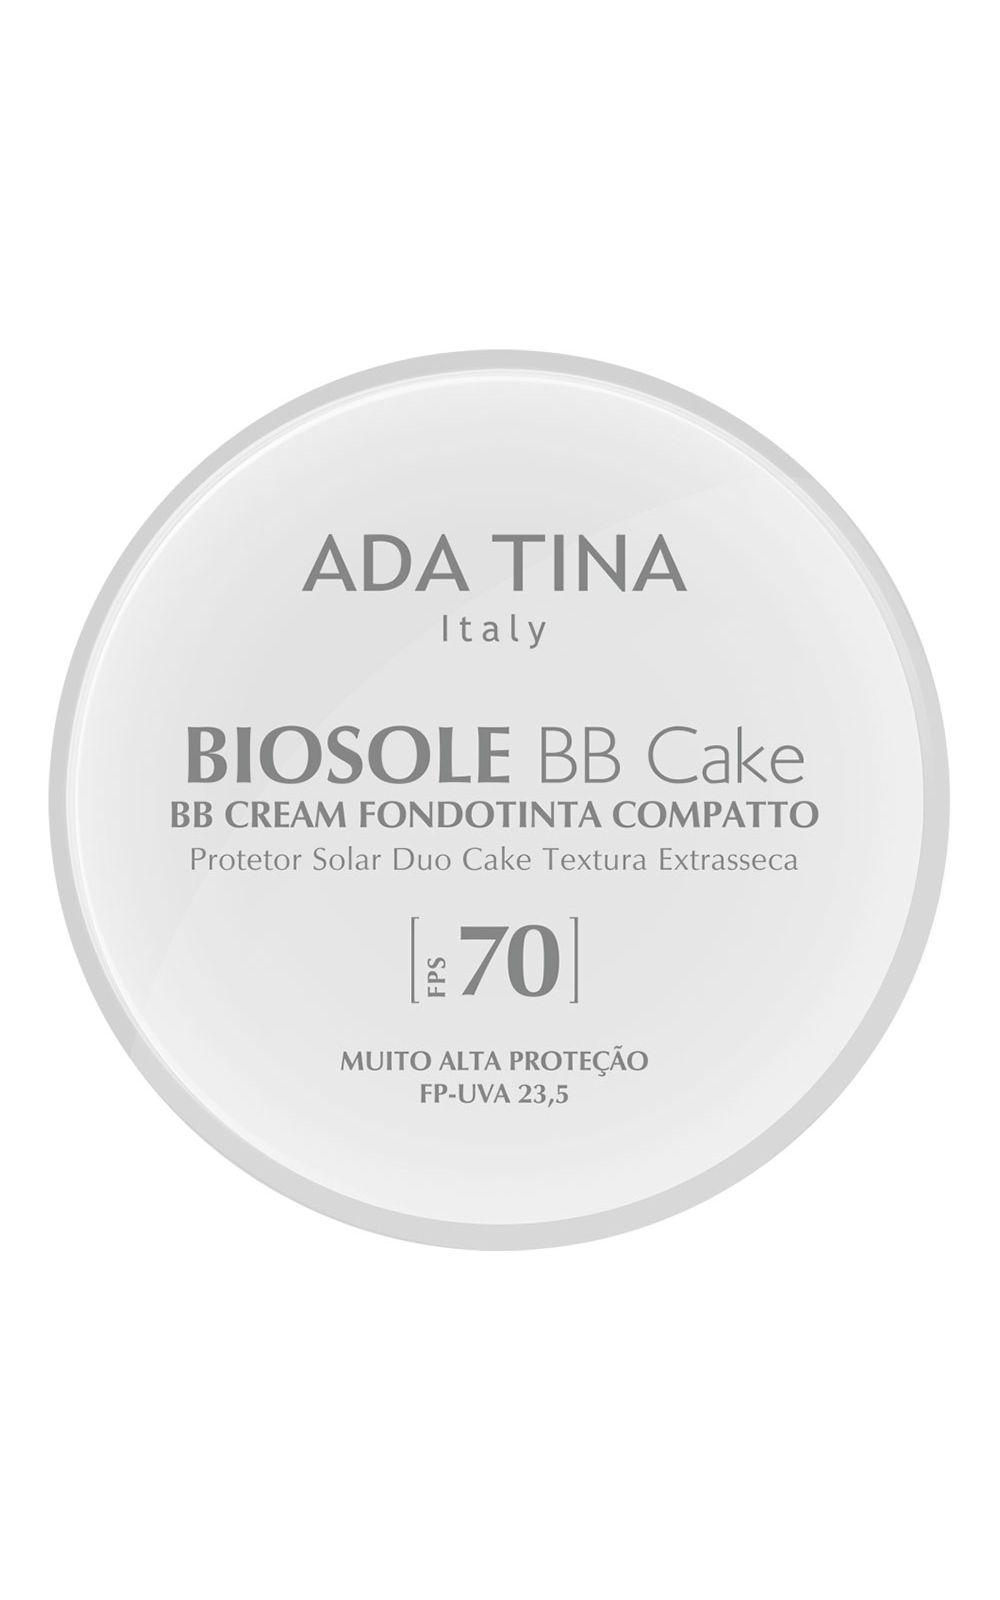 Foto 1 - Protetor Solar Anti Idade Adatina - Biosole Bb Cake FPS 70 - Bianco Cor 15